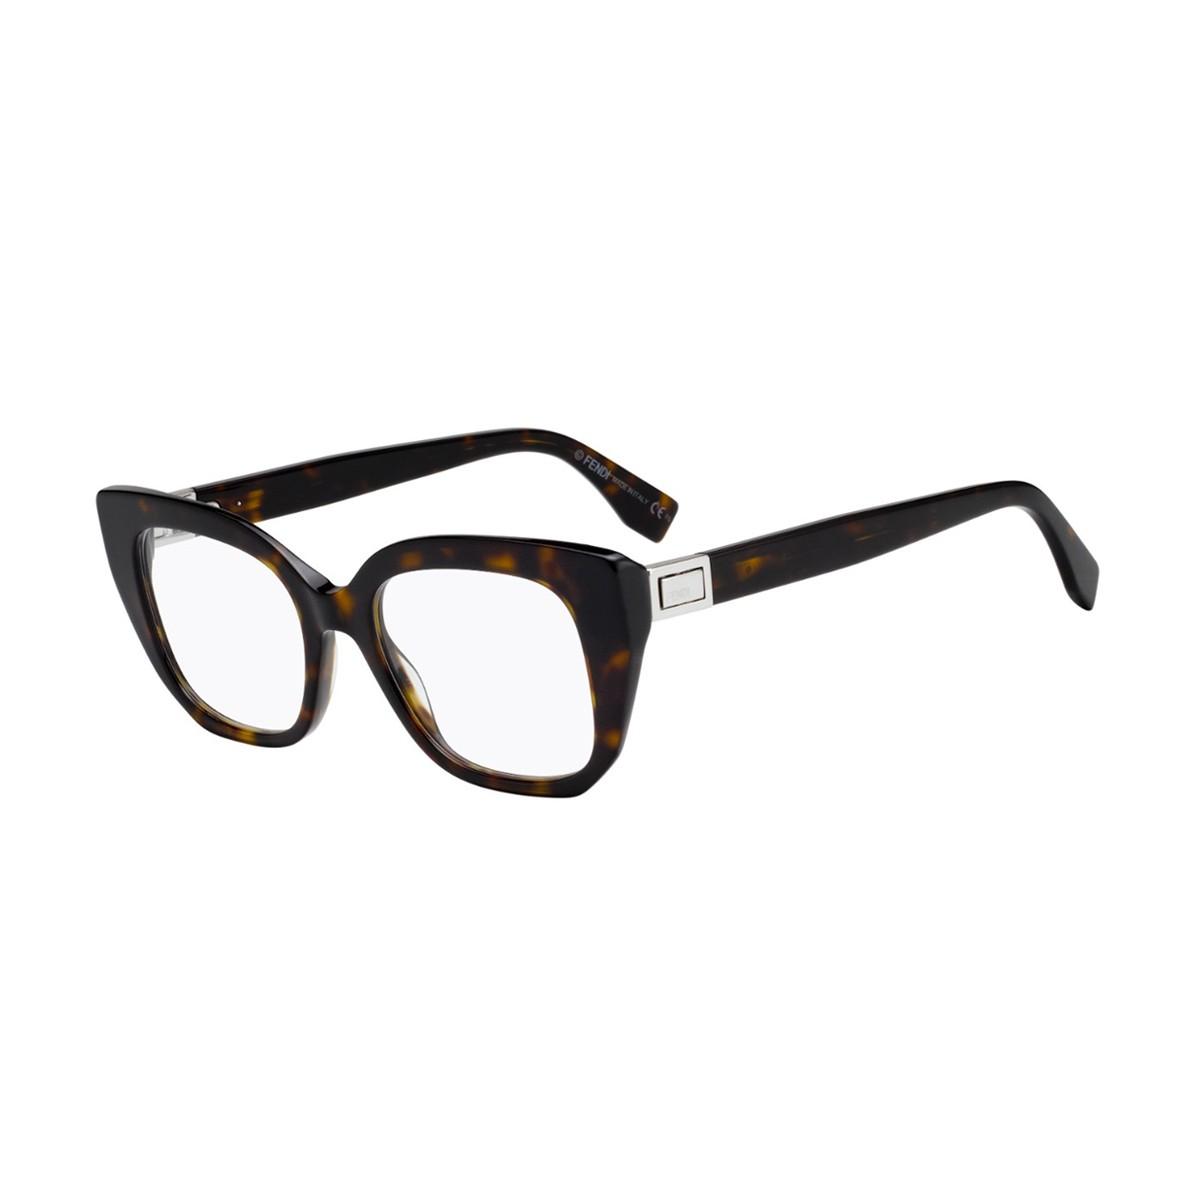 Fendi FF 0274 | Women's eyeglasses